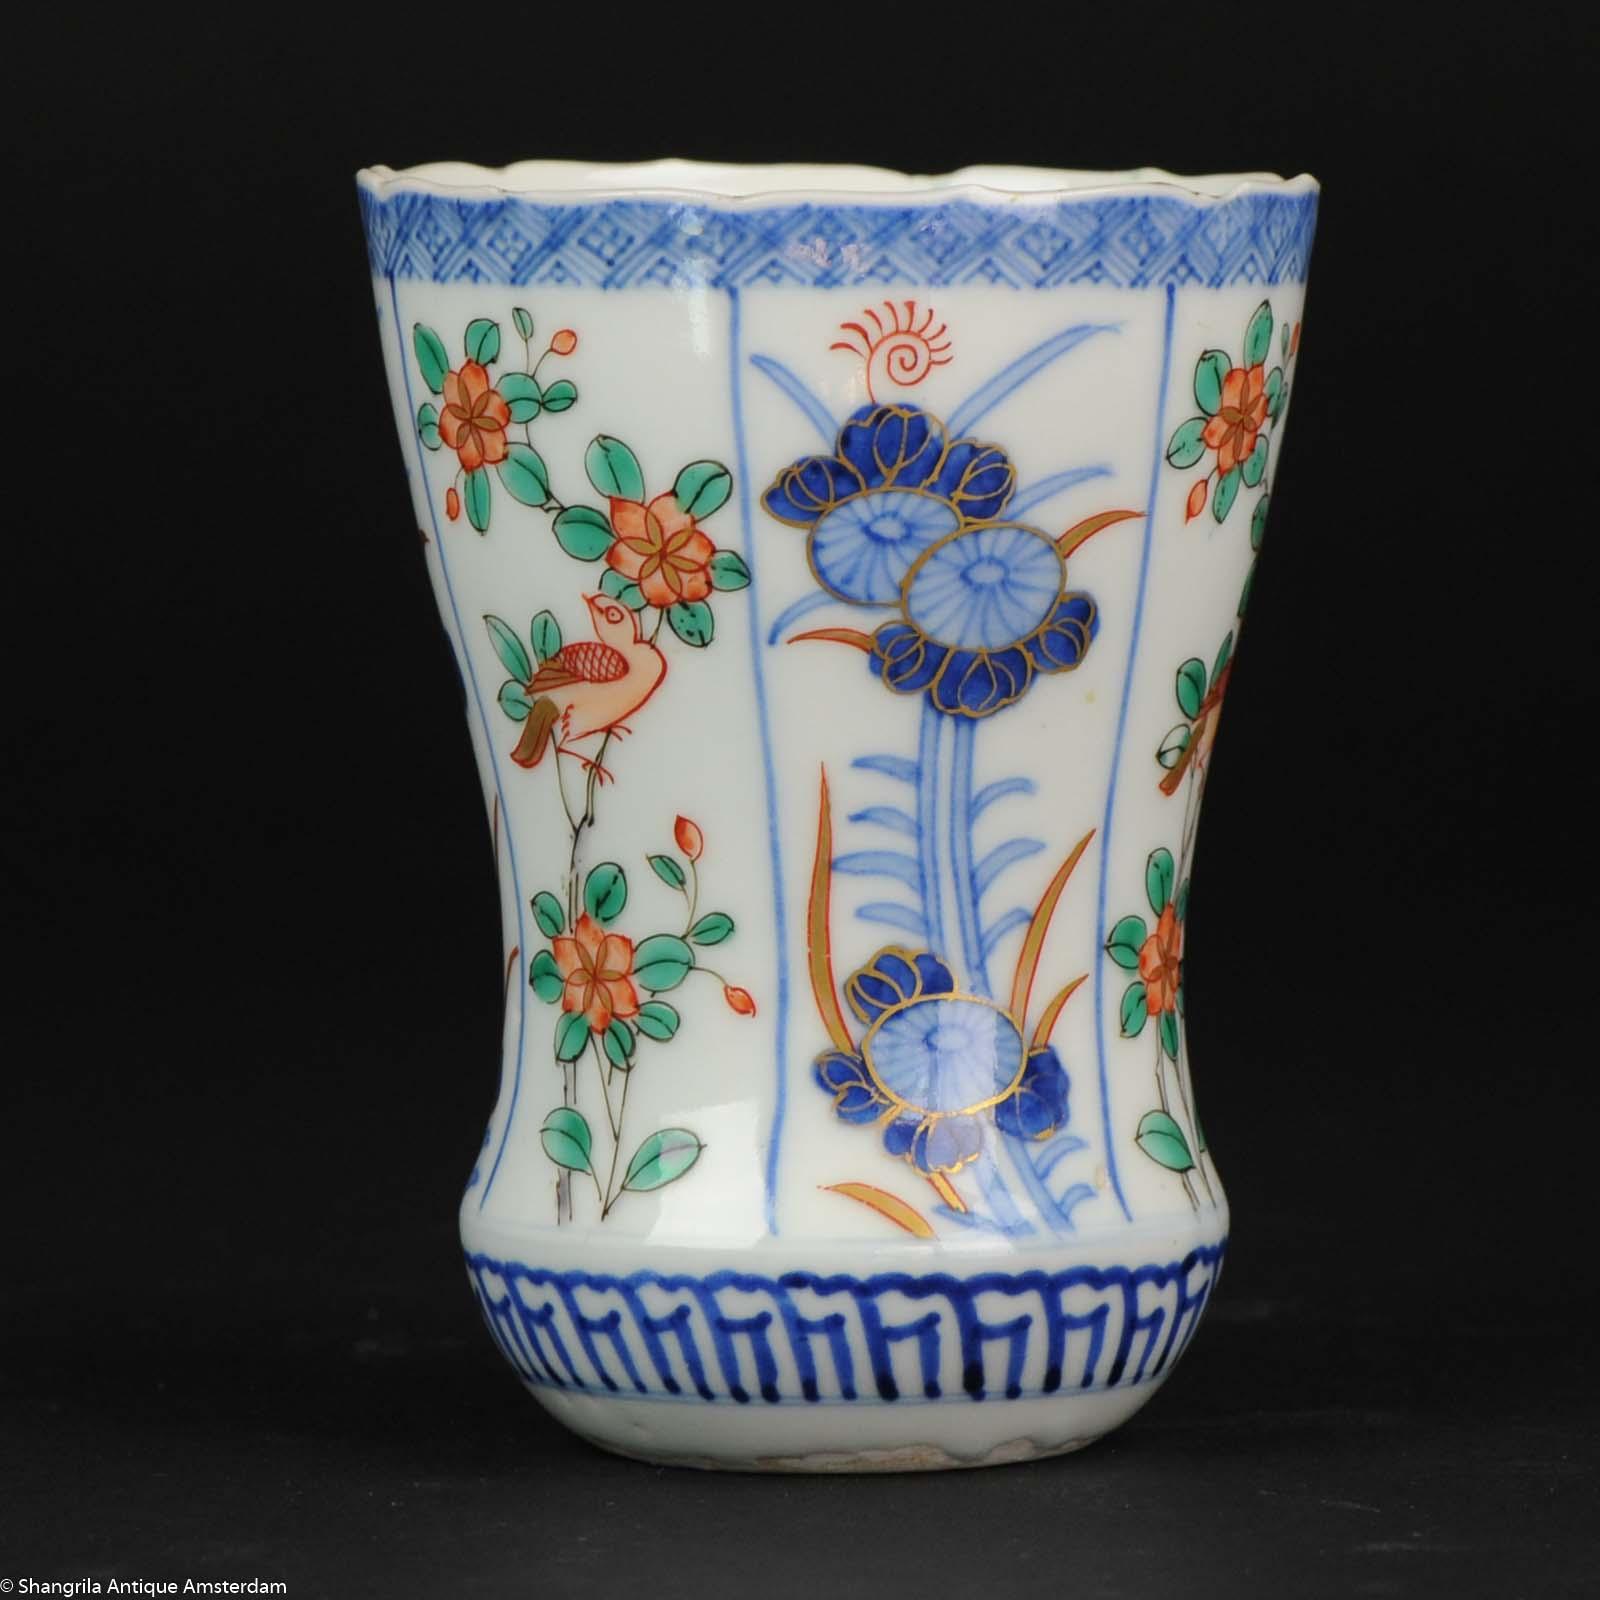 Antique edo meiji period japanese porcelain vase japan flowers period reviewsmspy